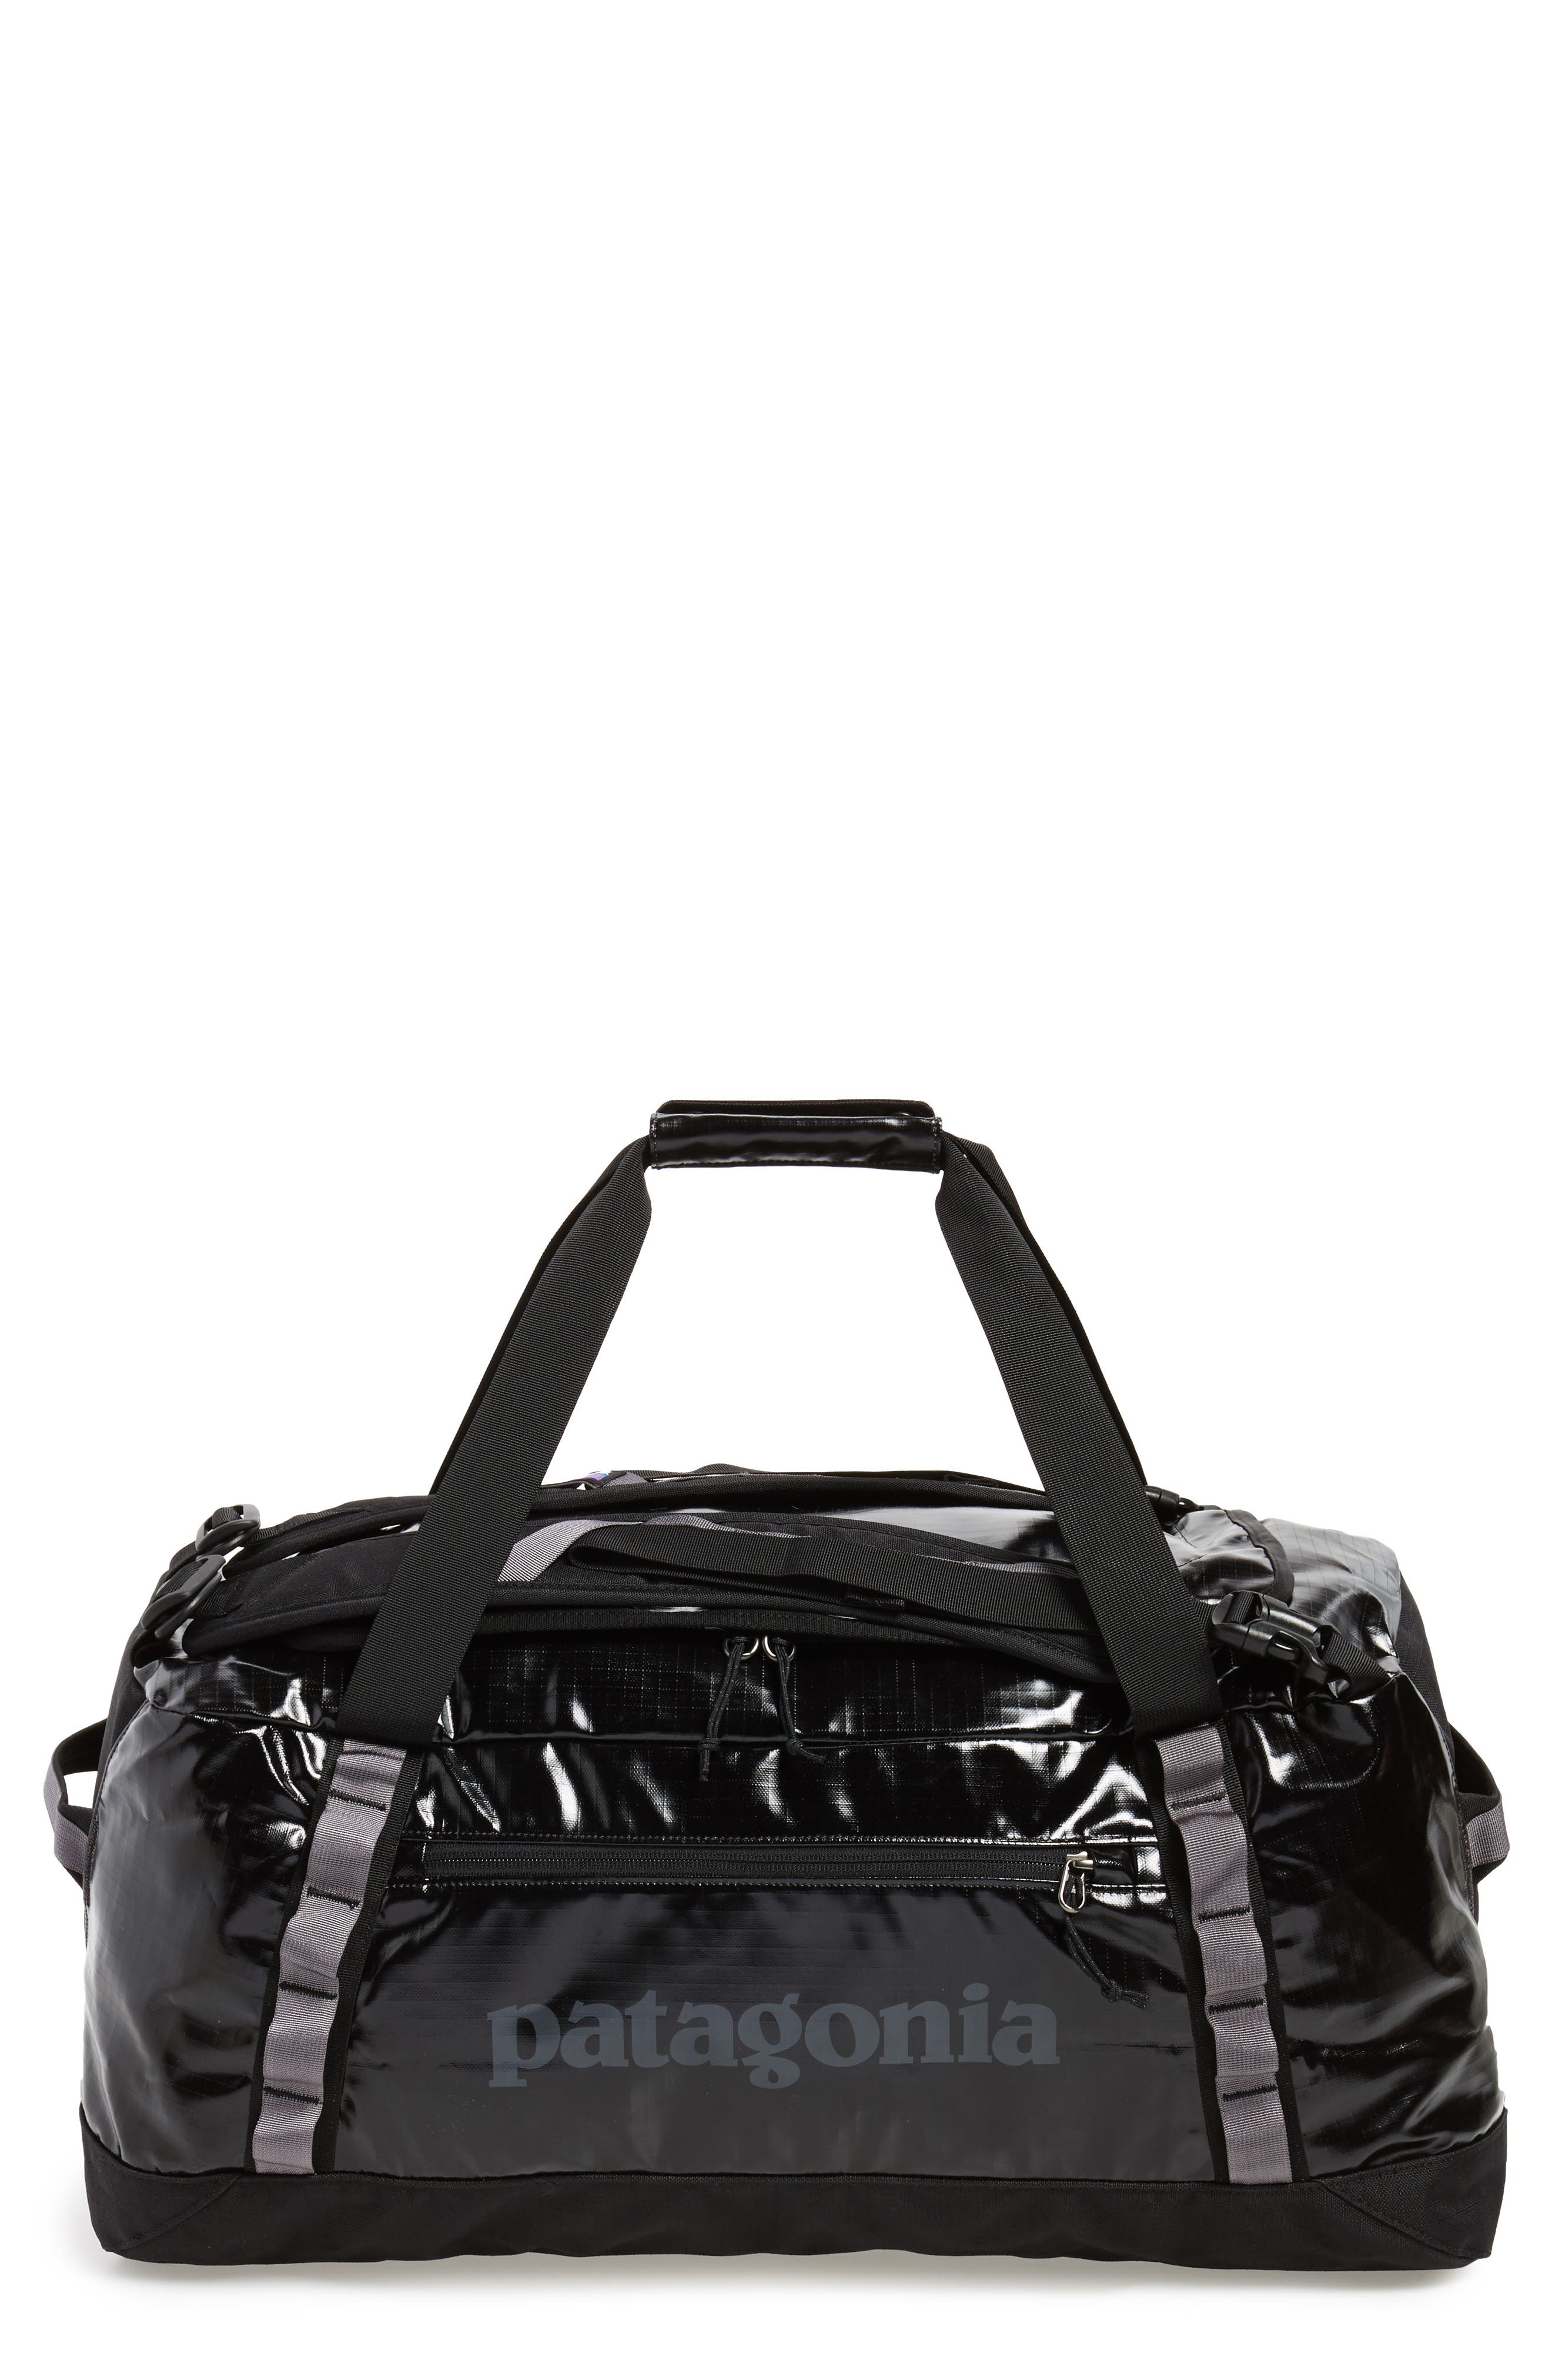 PATAGONIA, Black Hole Water Repellent 60-Liter Duffle Bag, Main thumbnail 1, color, BLACK